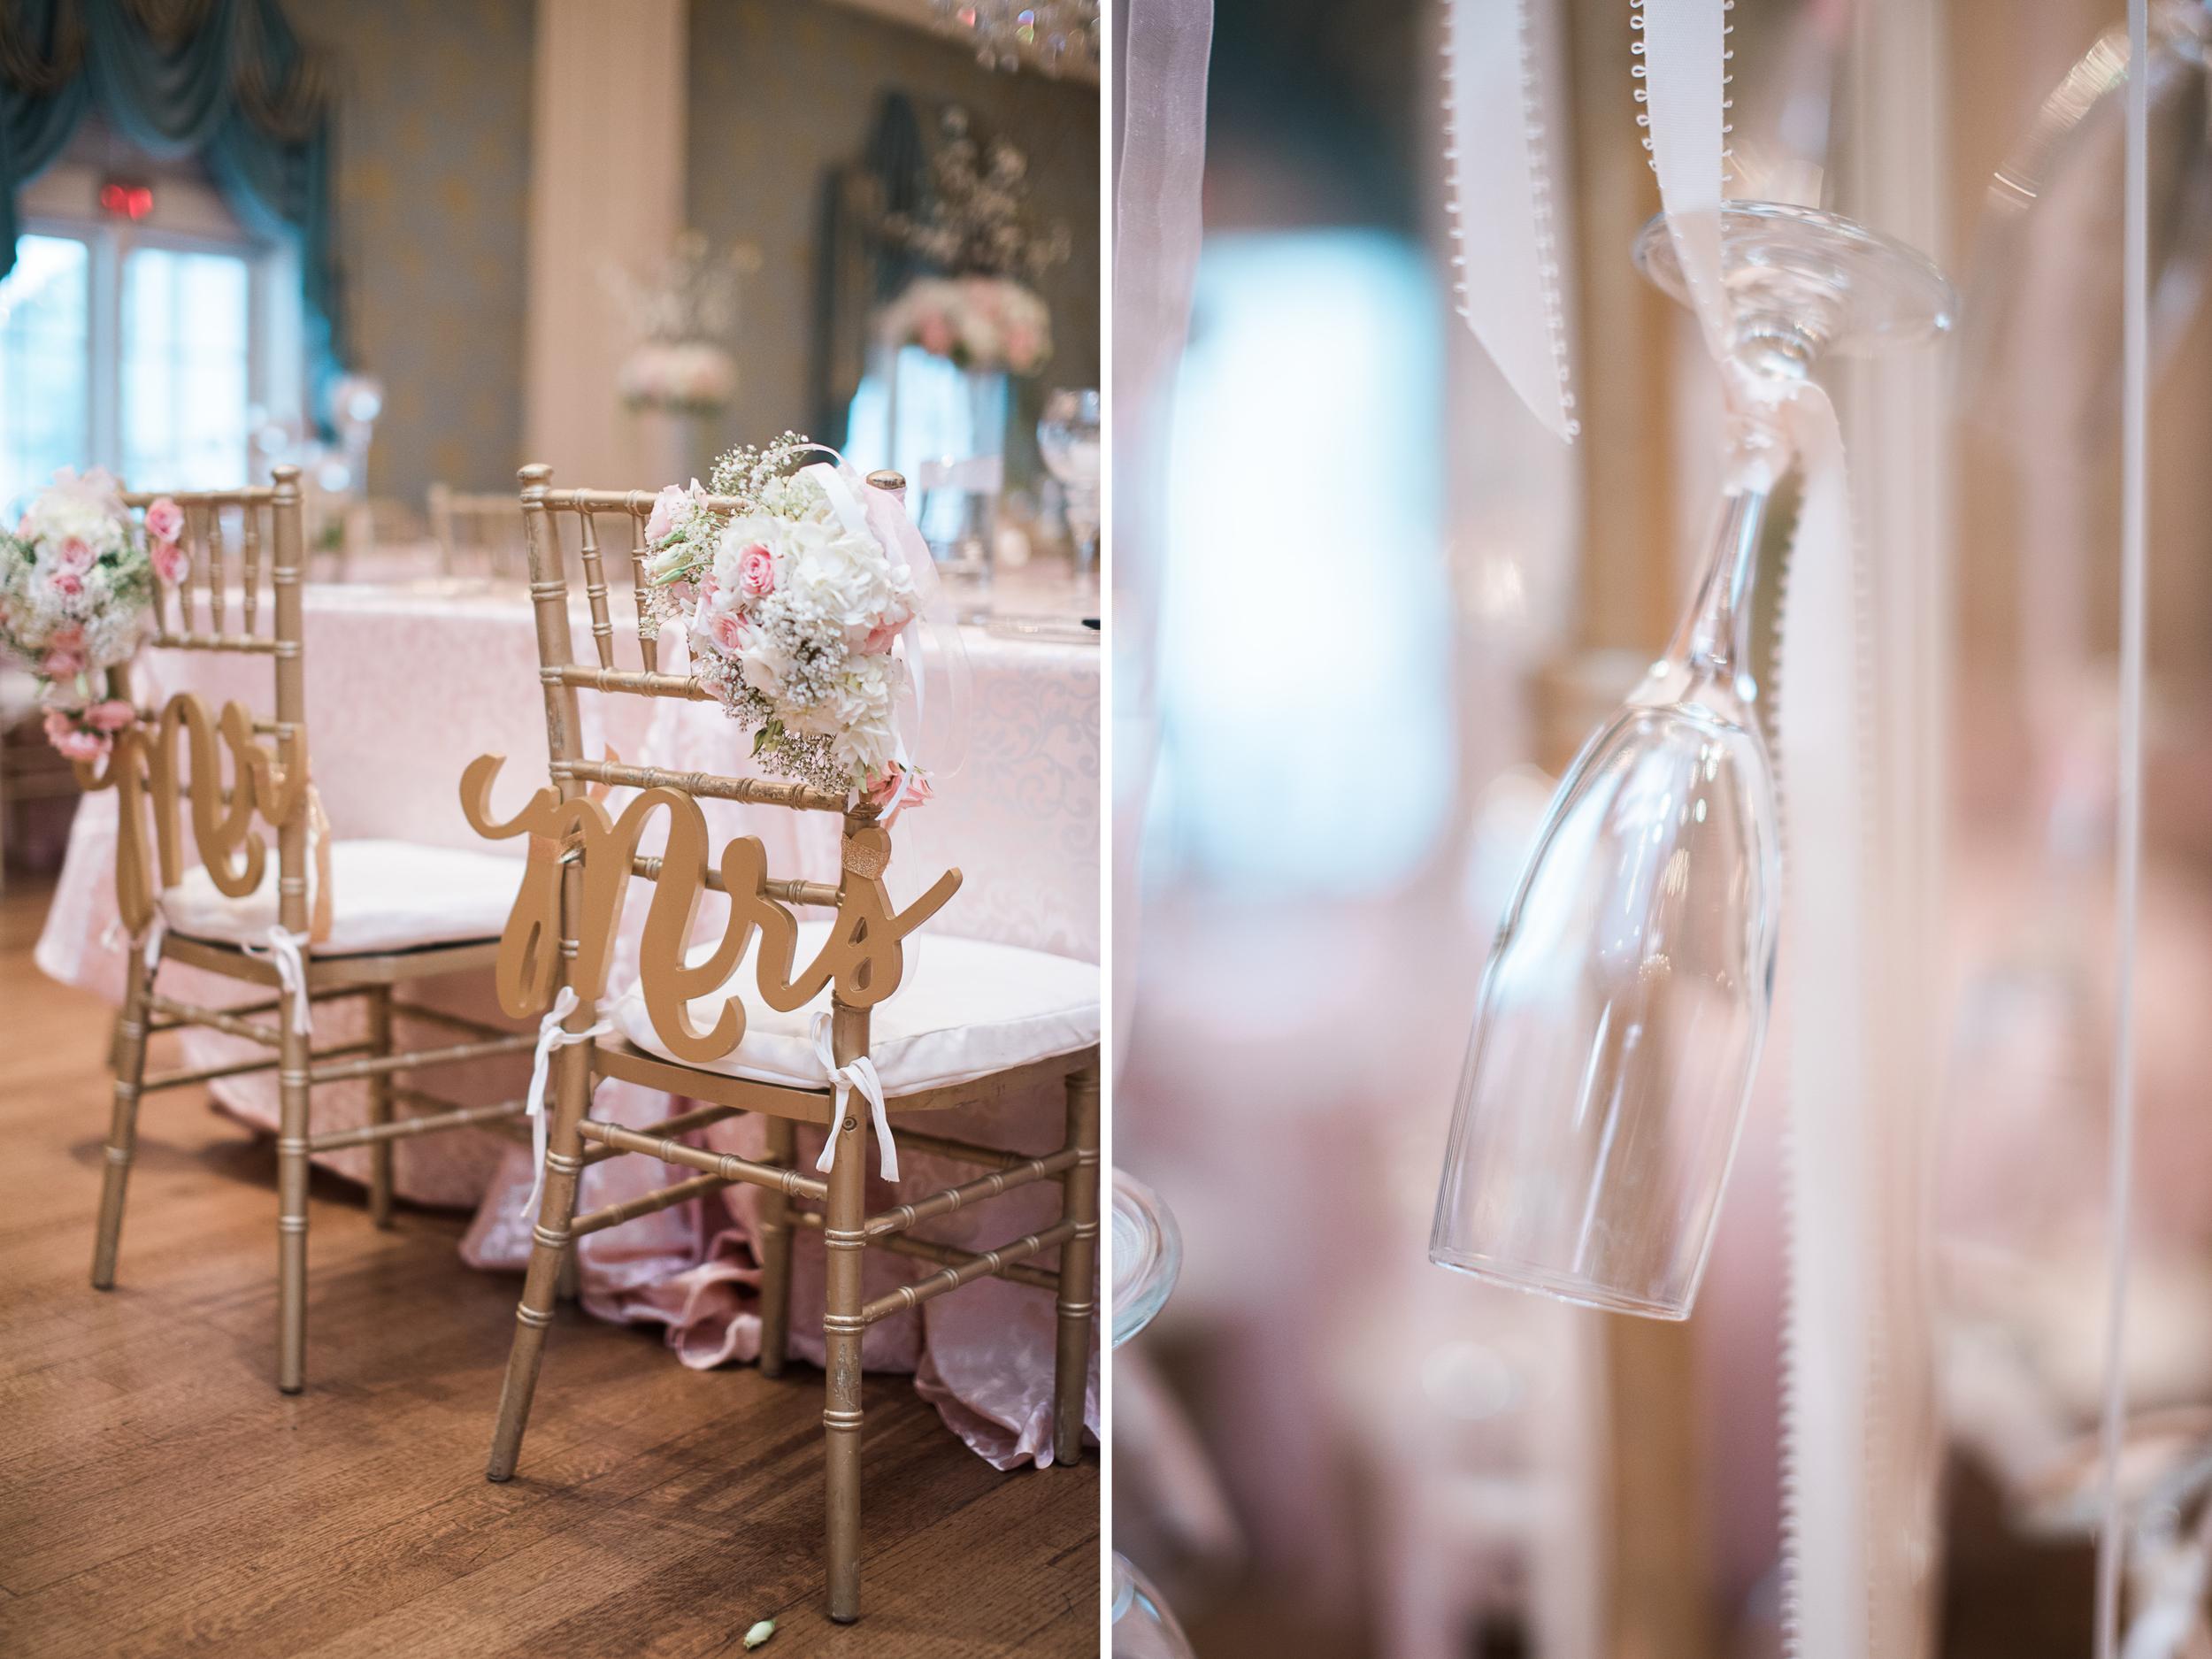 Dana-Fernandez-Photography-Weddings-in-Houston-Magazine-feature-Houston-wedding-photographer-film-142.jpg